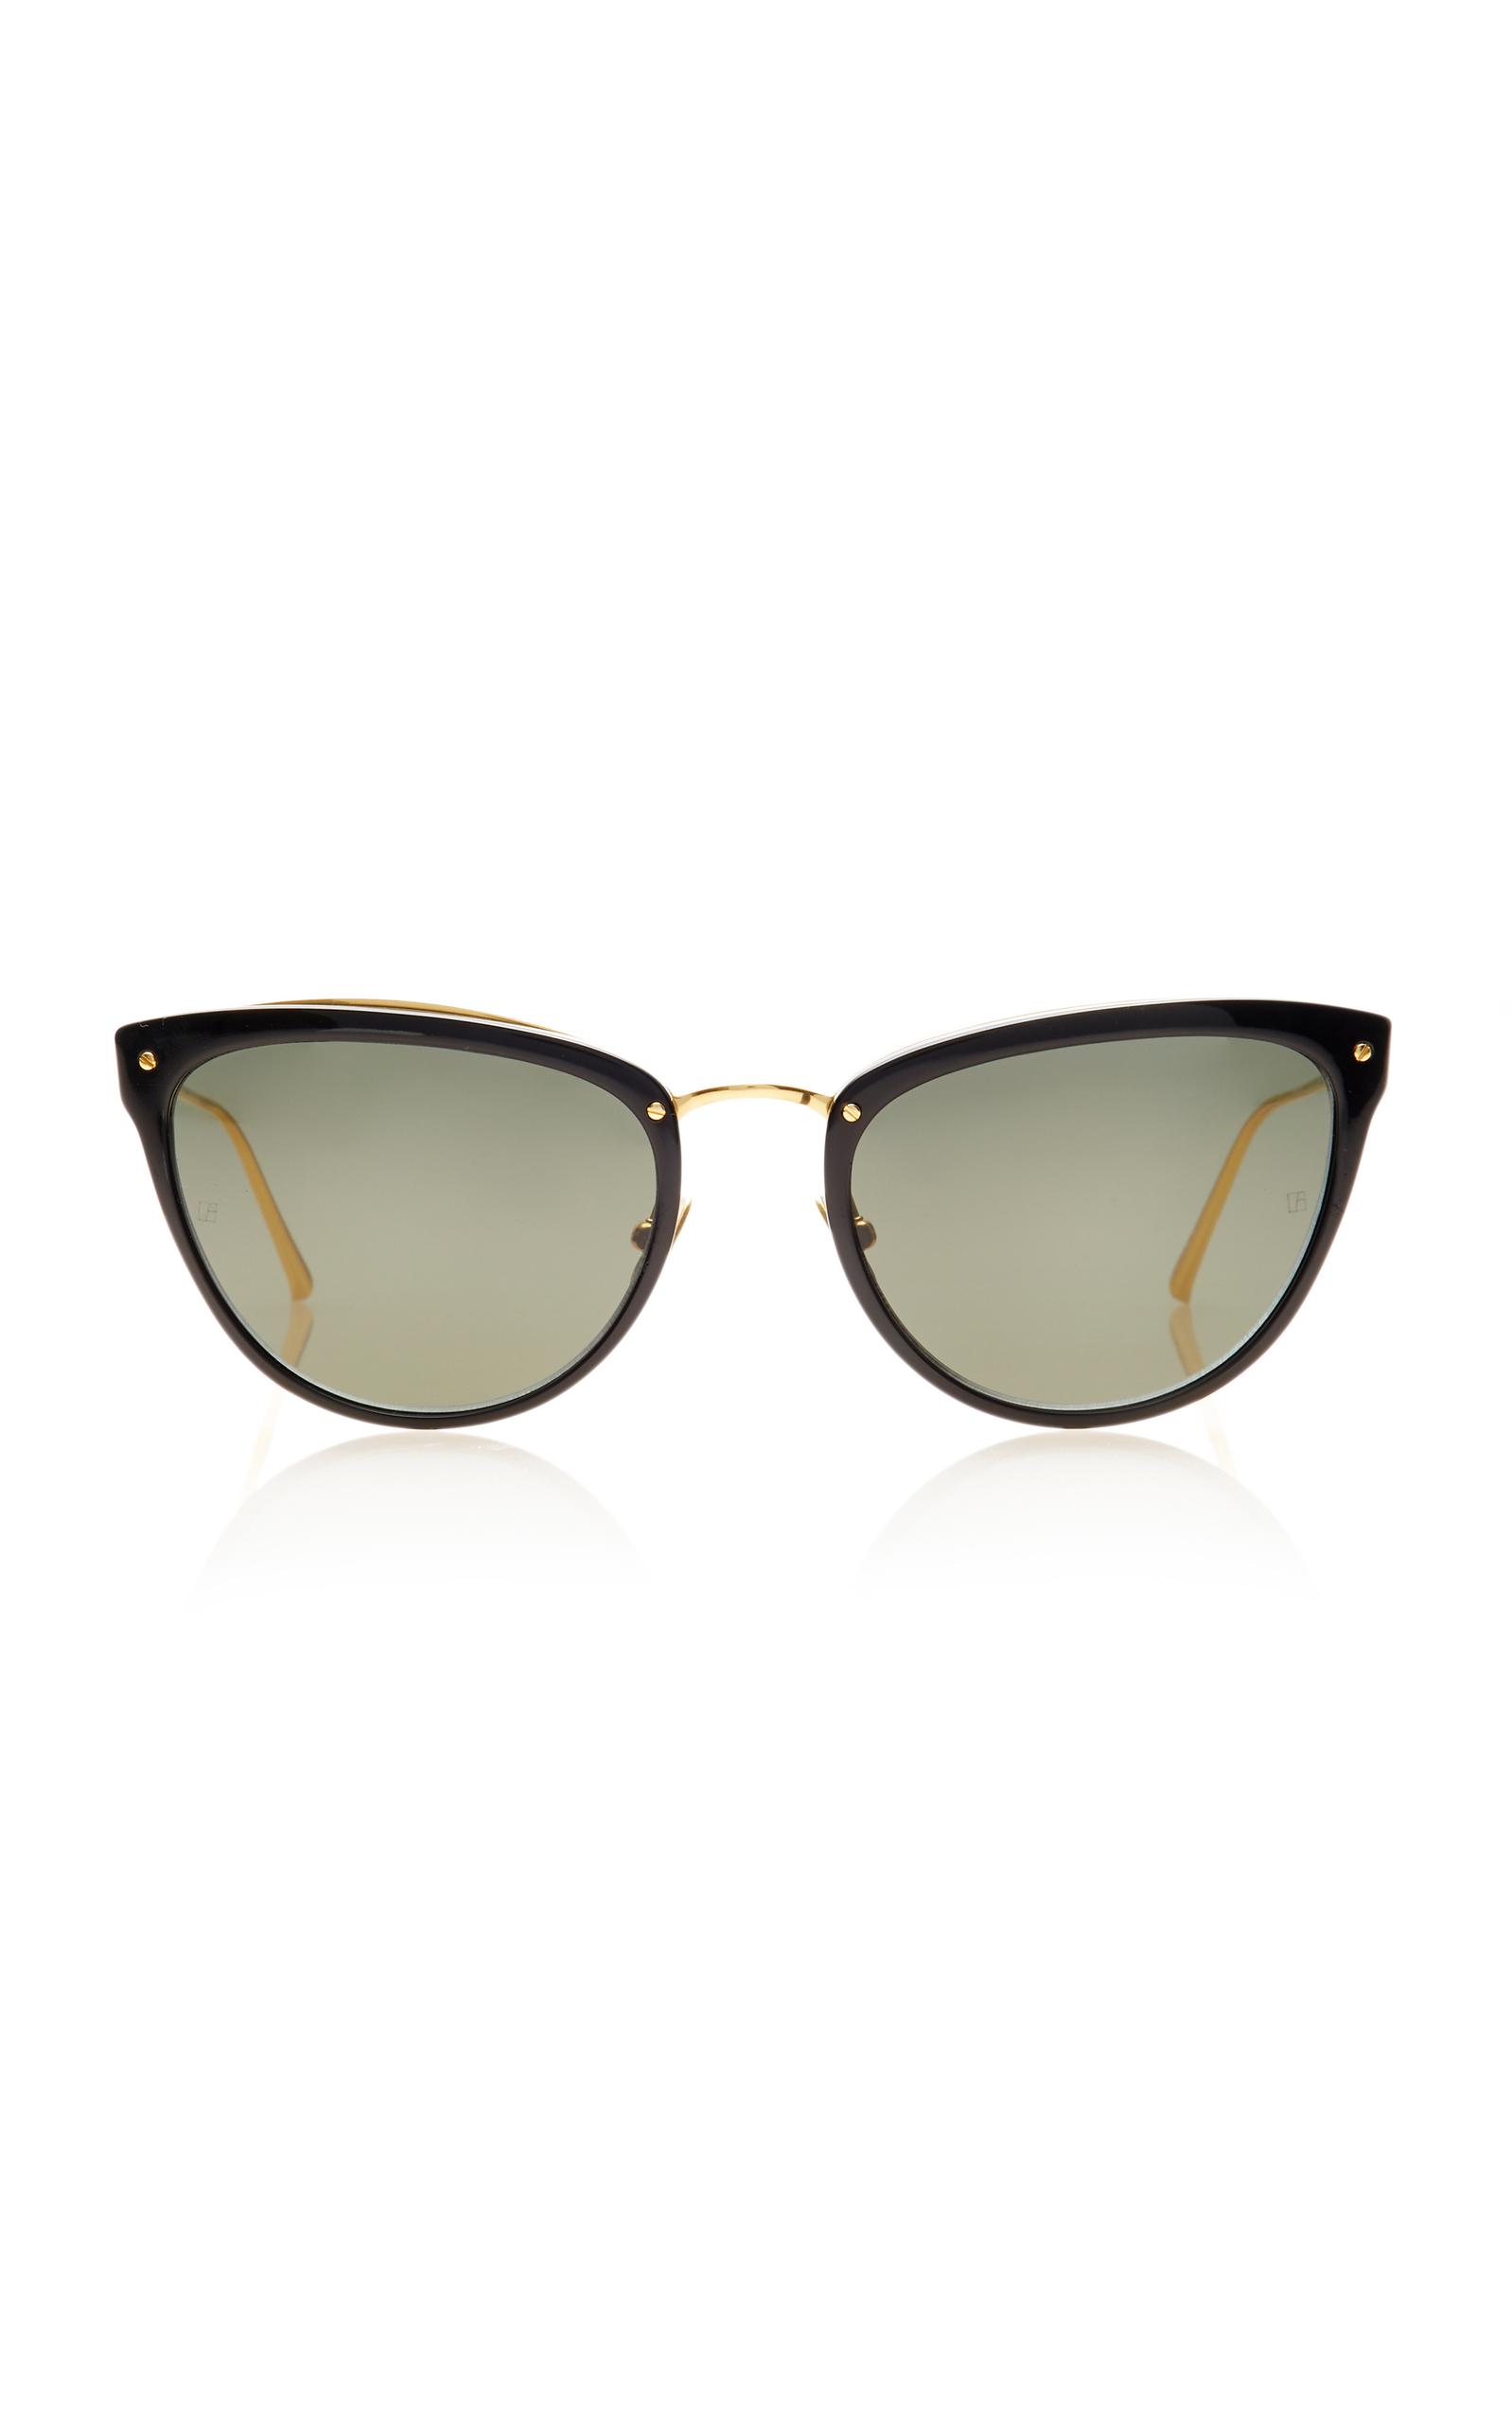 5cbbc197d6c Linda FarrowGold-Tone Titanium and Acetate Cat-Eye Sunglasses. CLOSE.  Loading